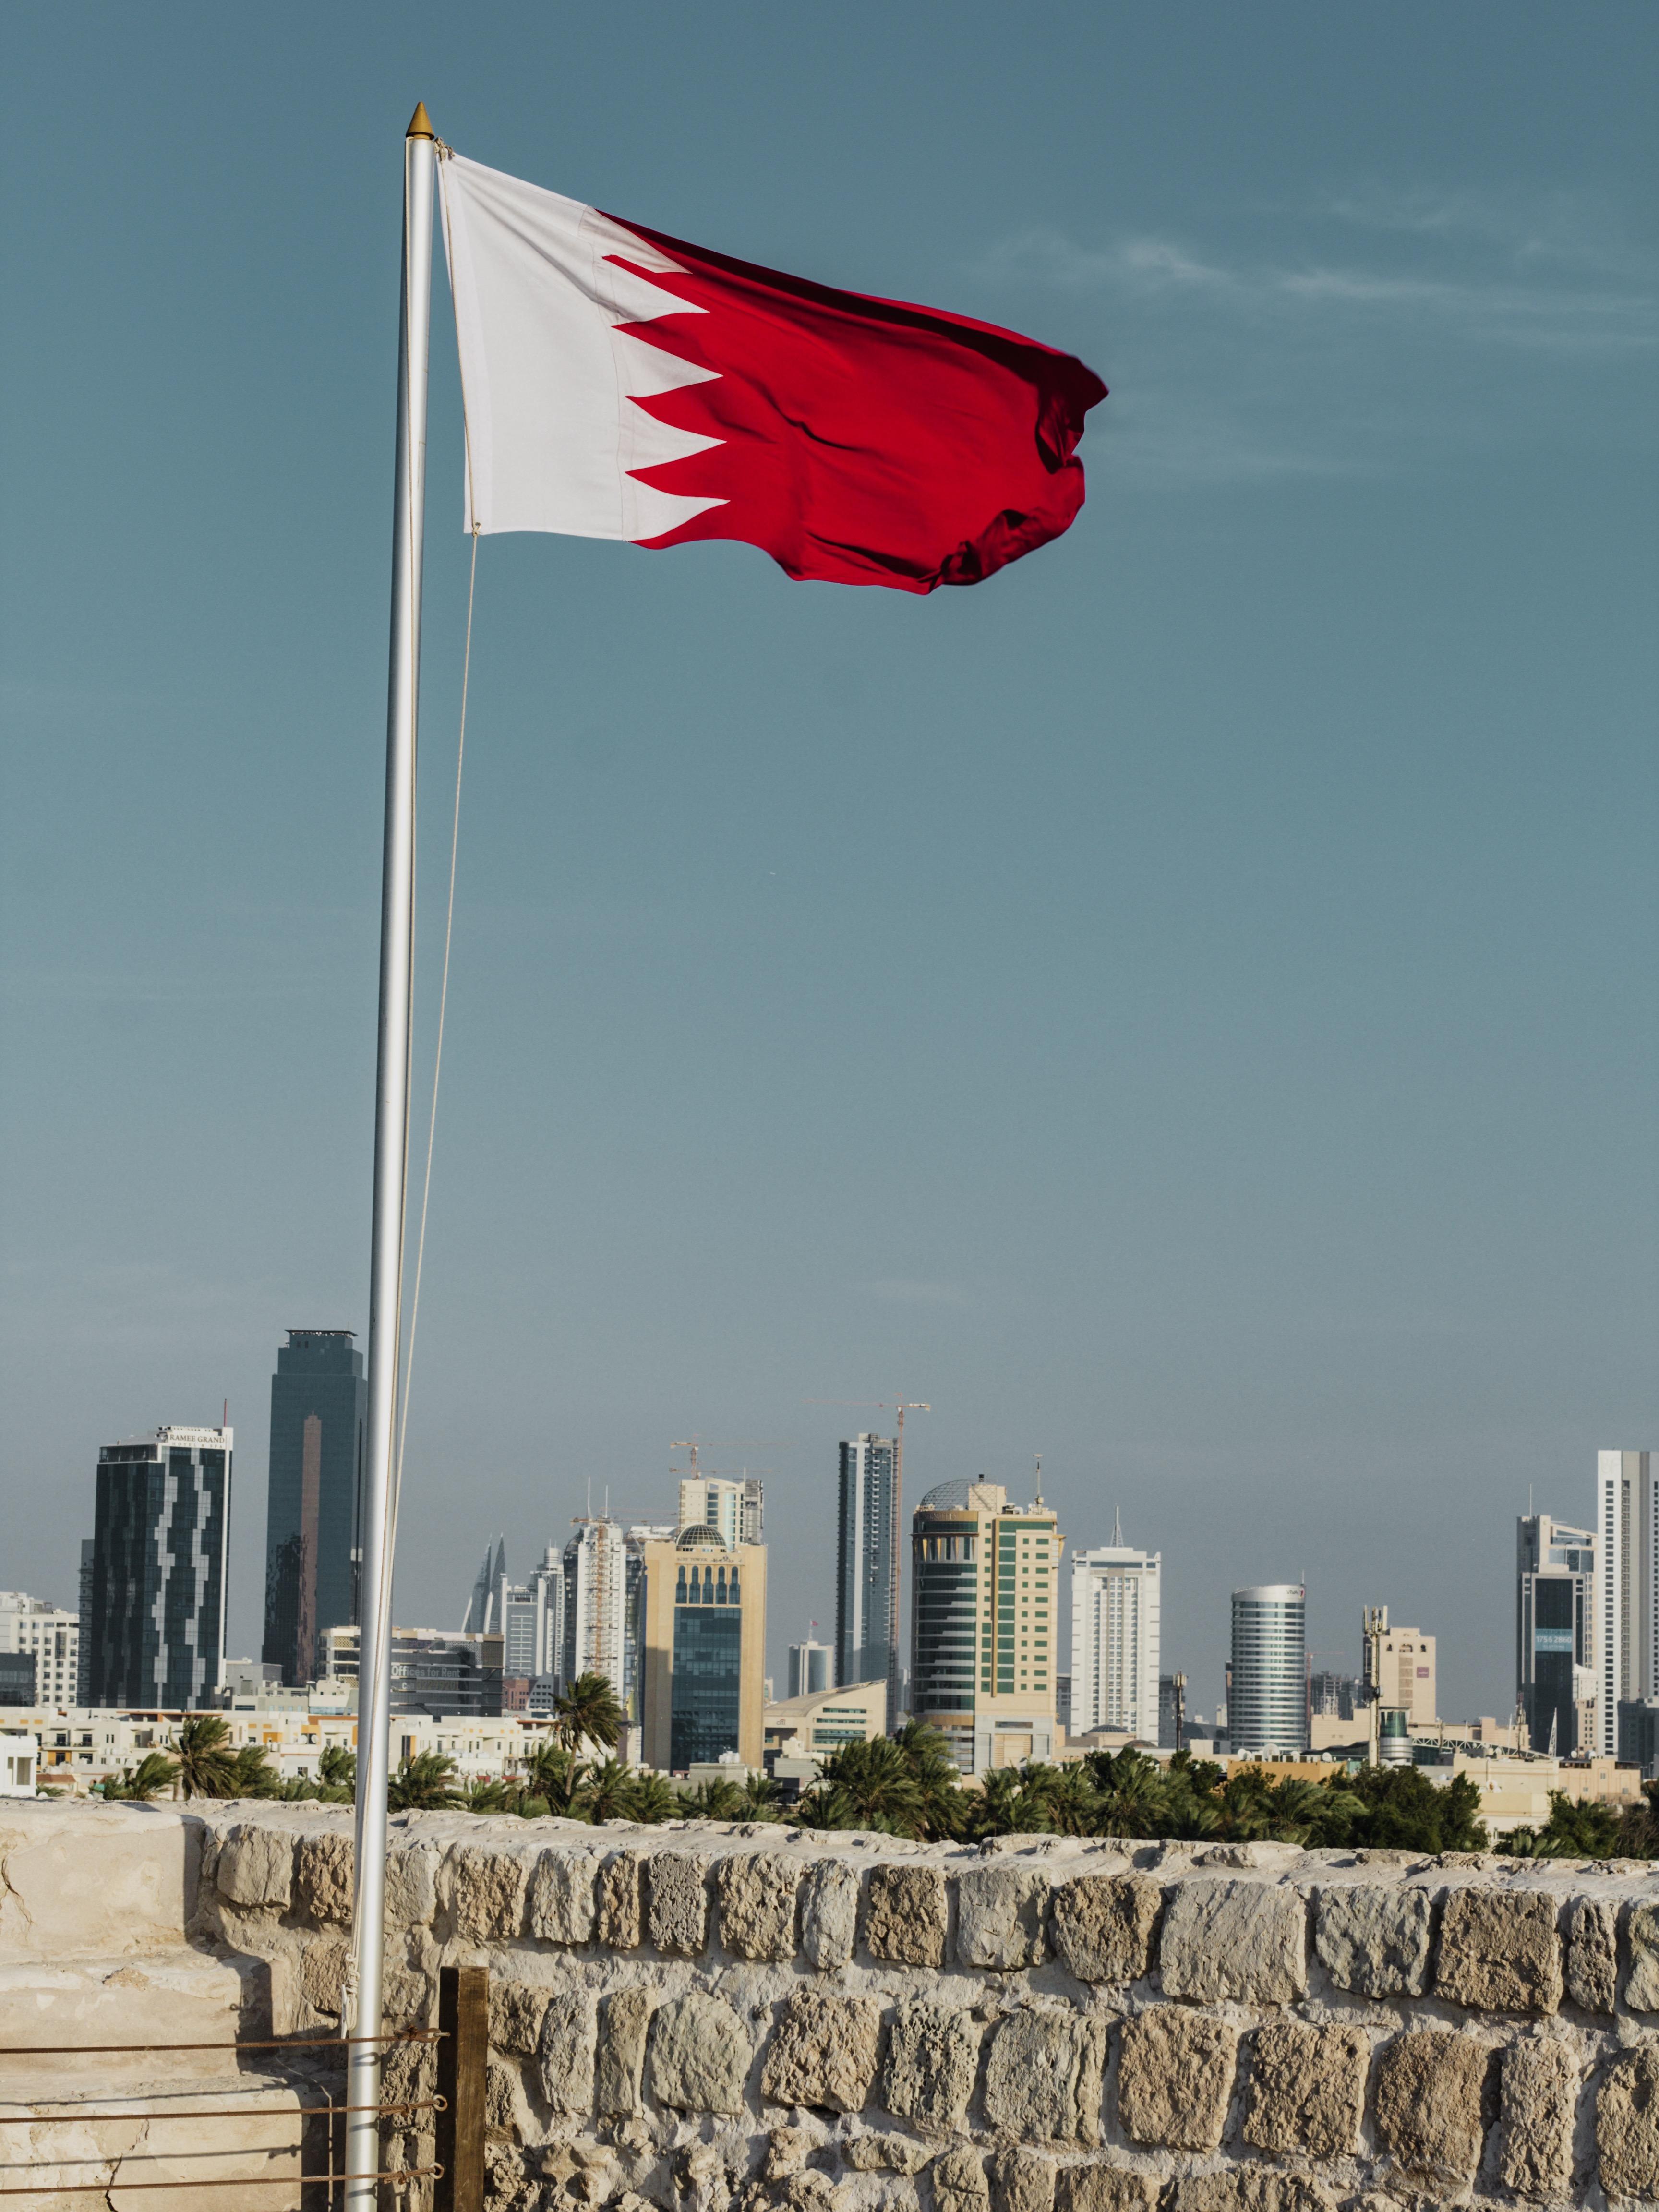 Illustrated by Sade - Bahrain flag and city skyline views